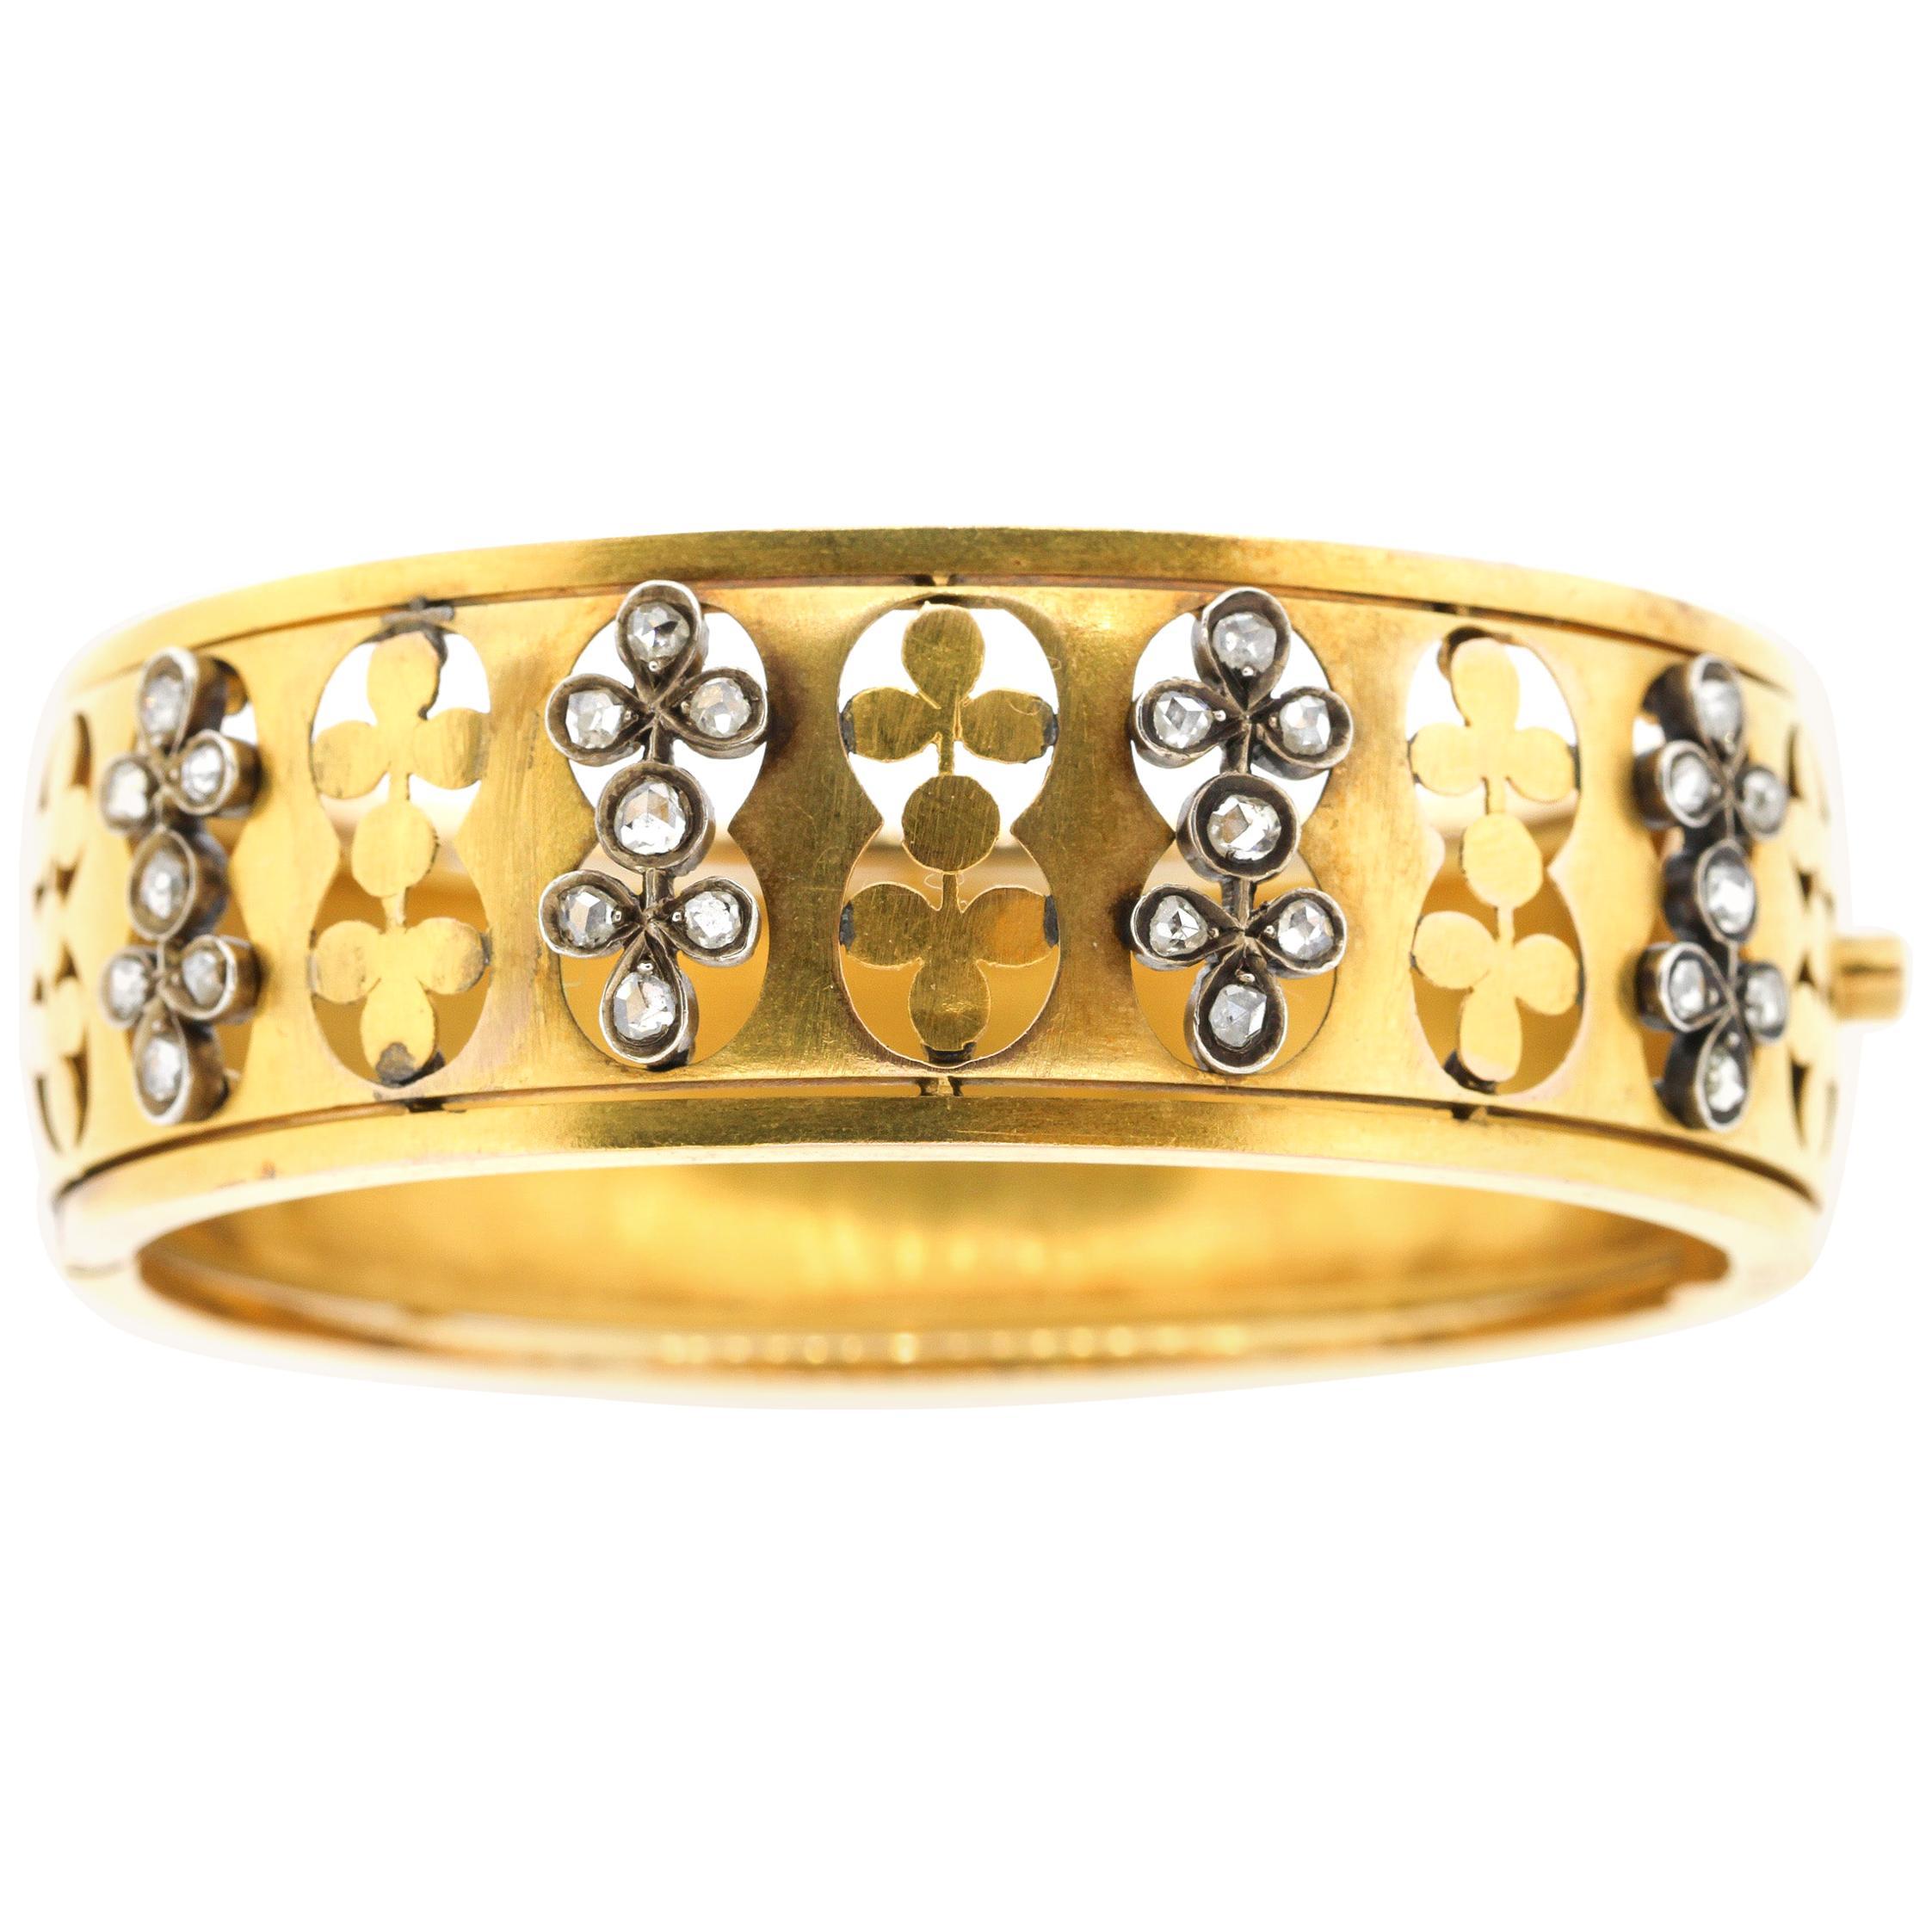 Antique Victorian 18  Karat Yellow Gold Rosecut Diamond Bangle Bracelet